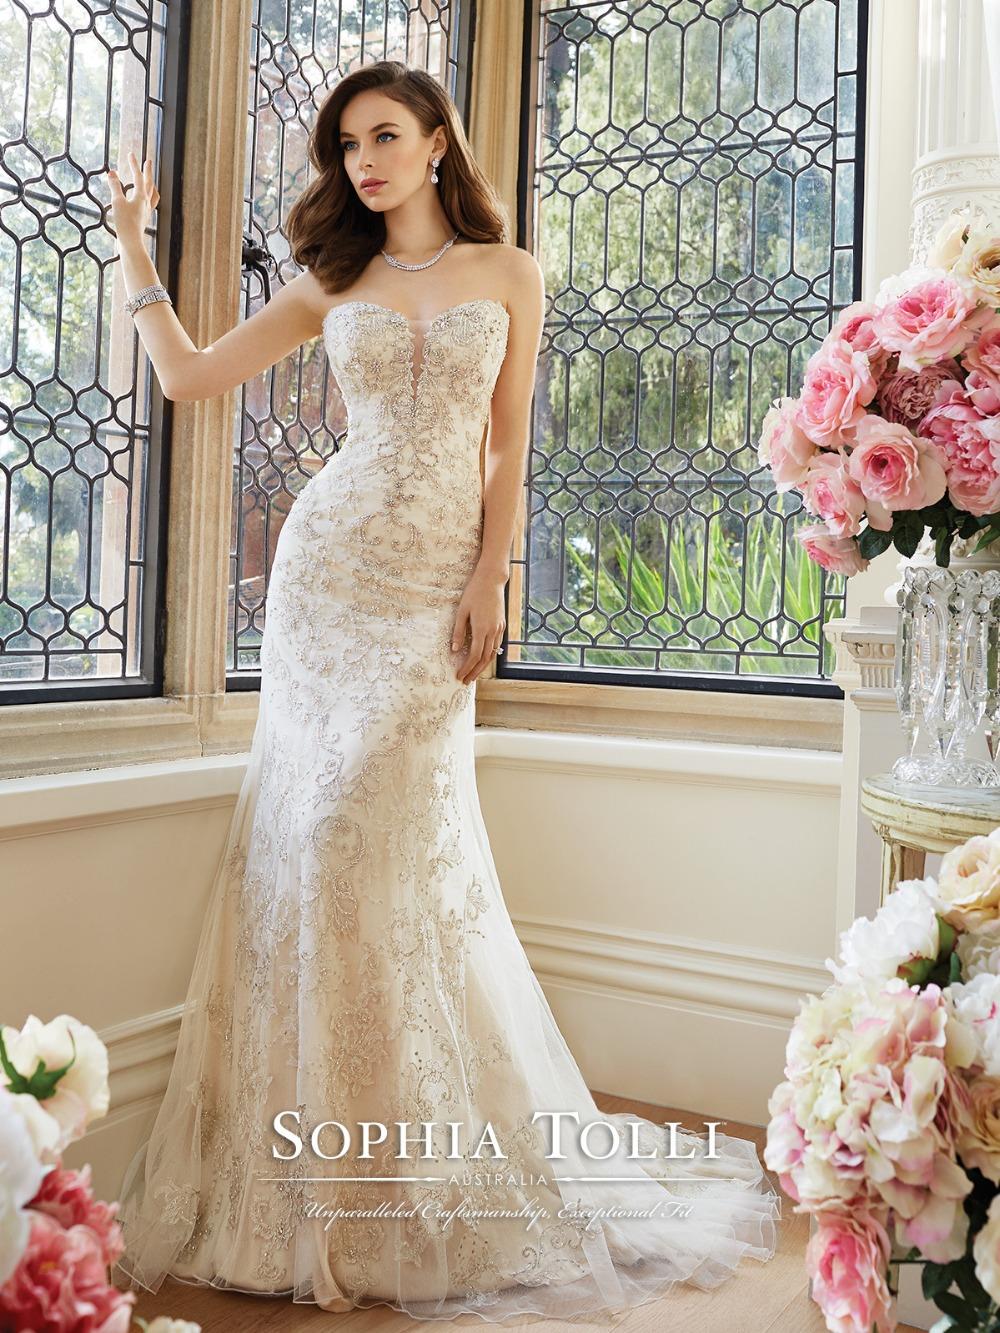 online buy whole glamorous wedding dress designs from r tic design glamorous lace beaded bridal gown organza sexy crystal mermaid wedding dress 2016 vestido de